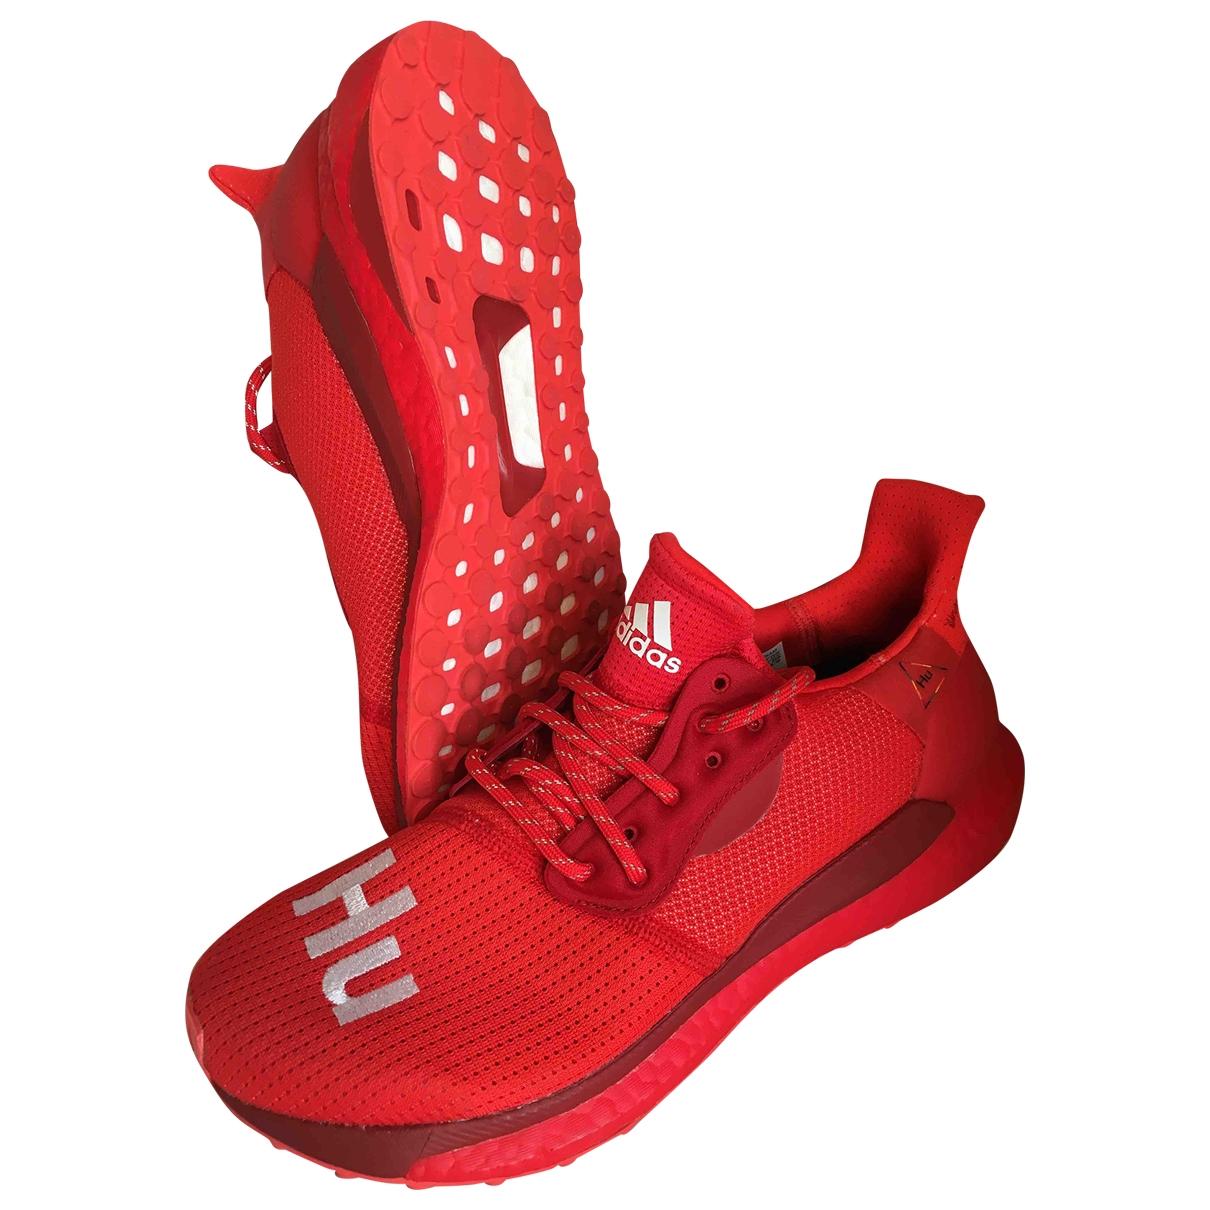 Adidas X Pharrell Williams NMD Hu Red Cloth Trainers for Men 42 EU